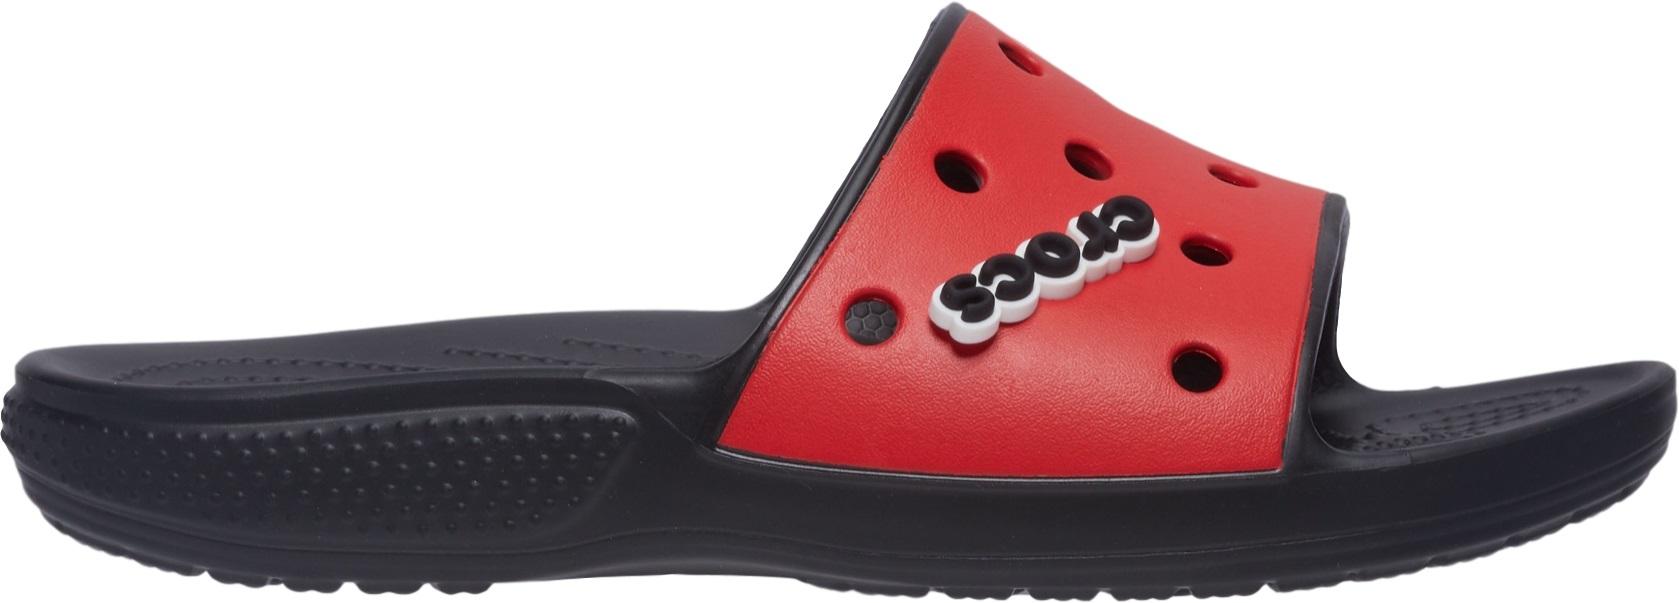 Crocs™ Classic Colorblock Slide Black/Flame 42,5